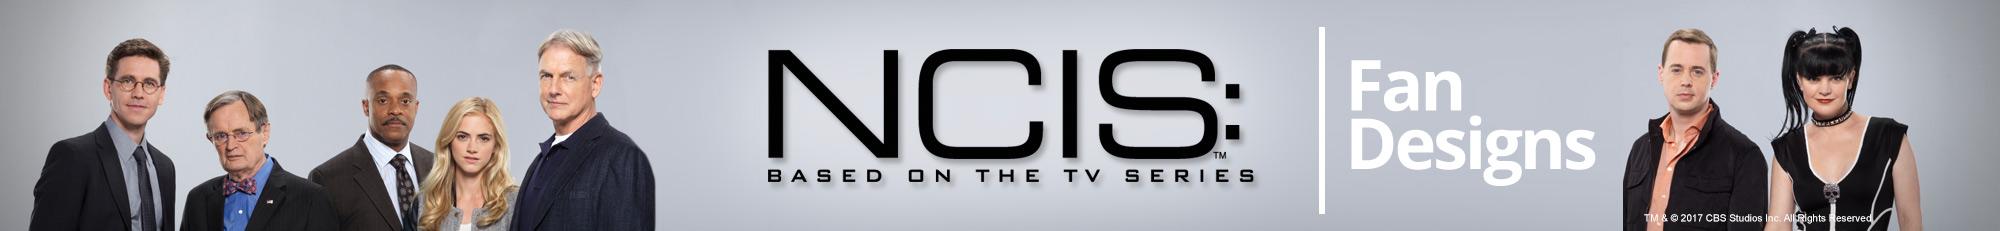 NCIS Gifts